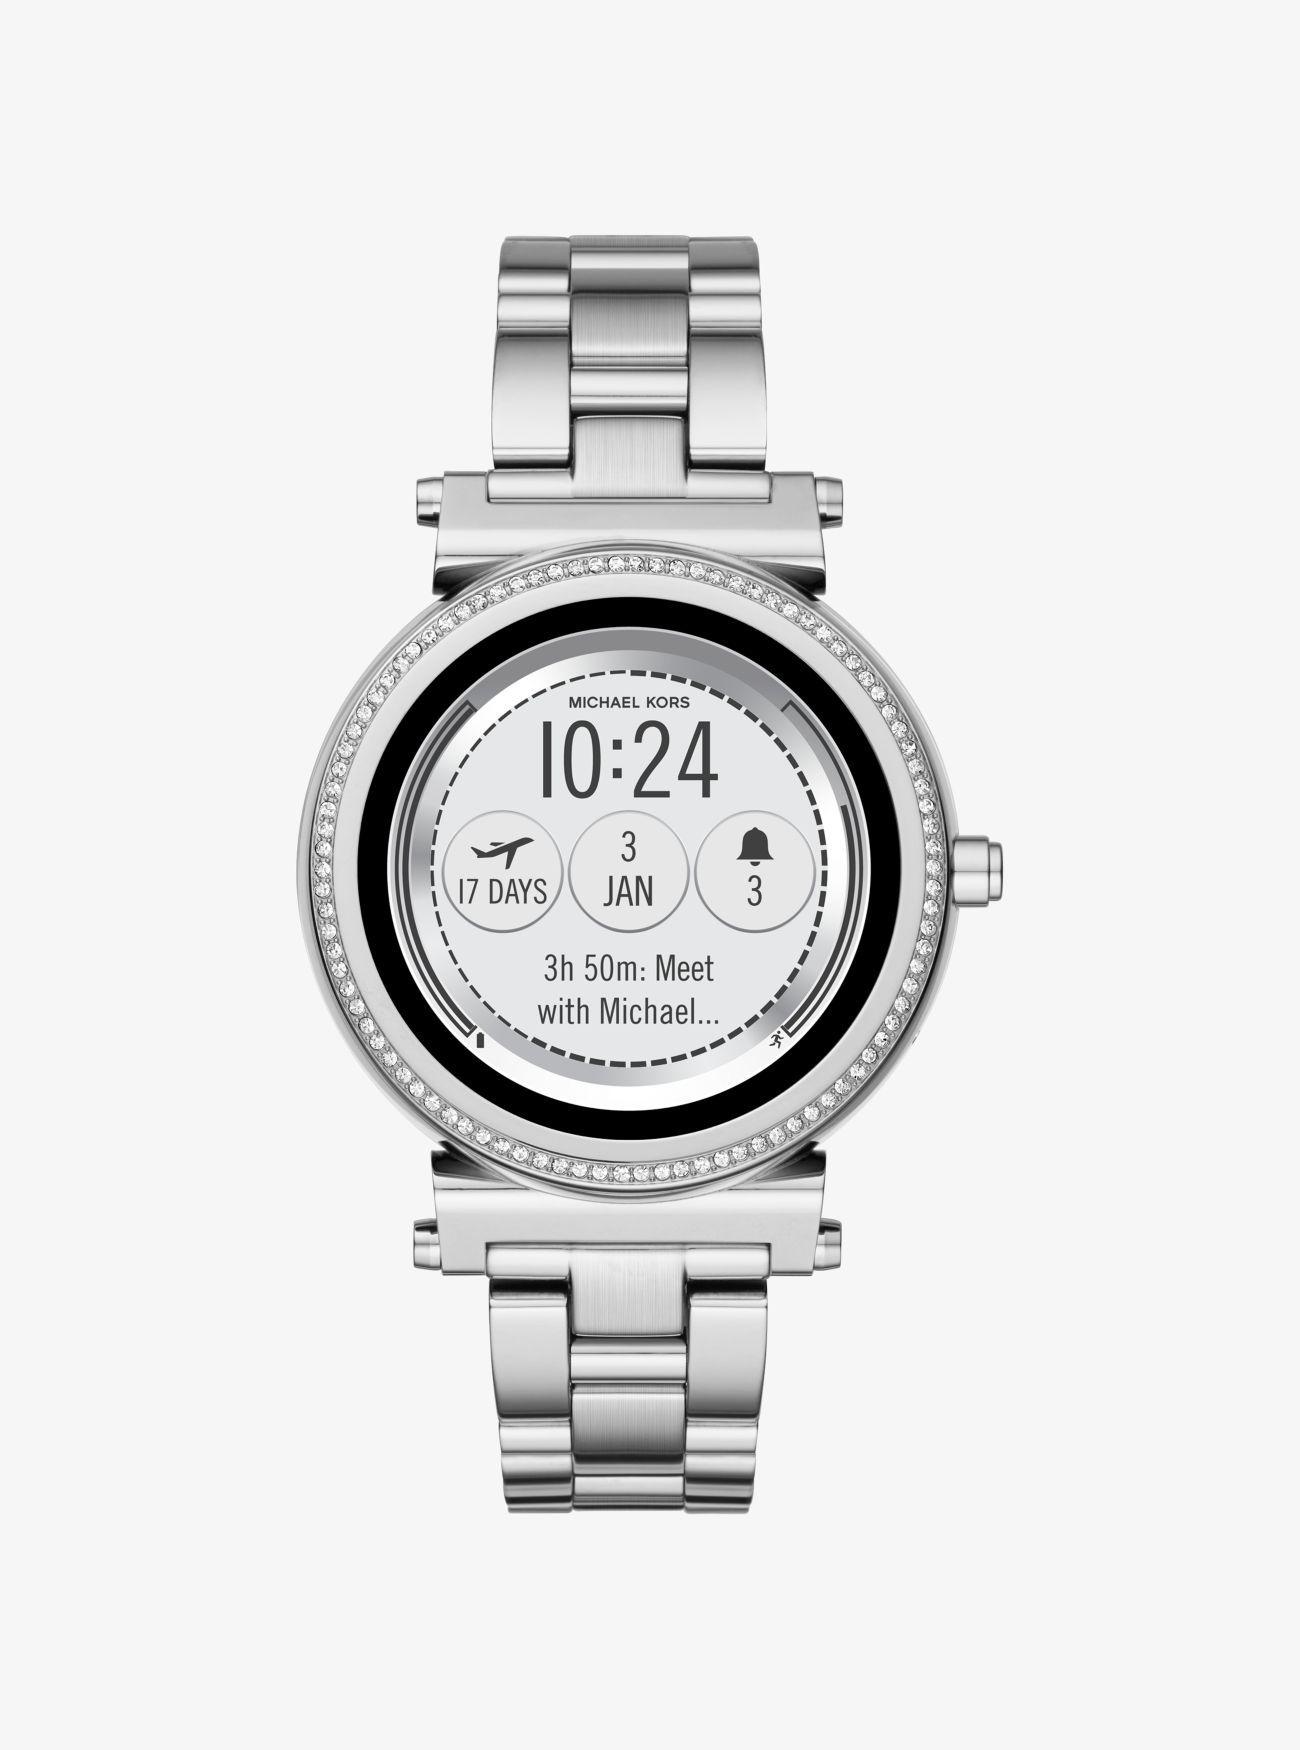 Sofie Pavé SilverTone Smartwatch Smart watch, Kor